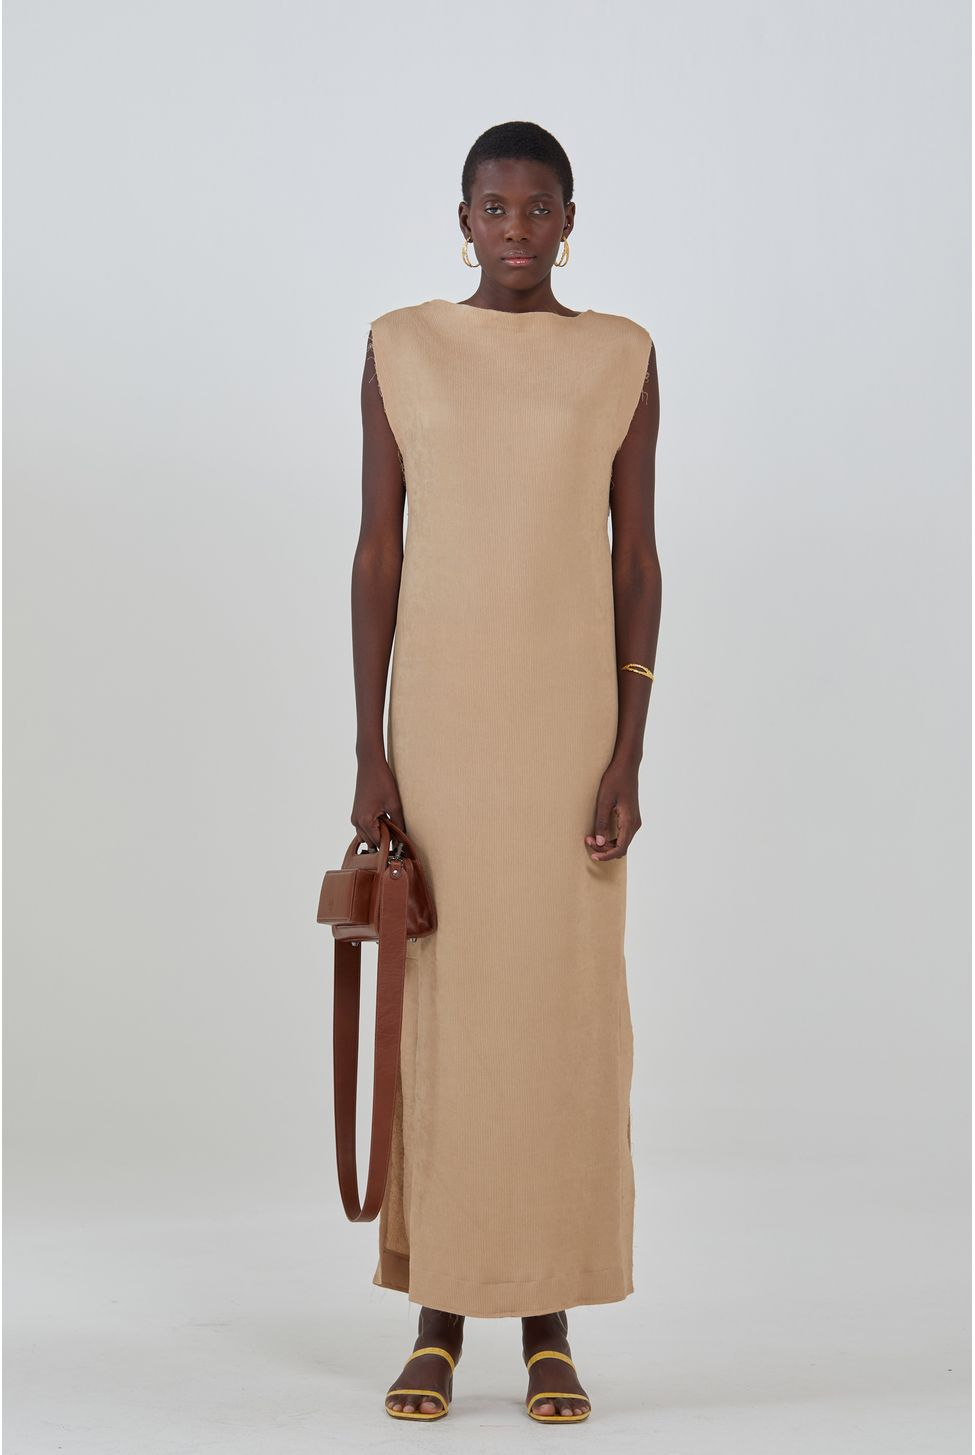 misci-vestido-marrom-frente